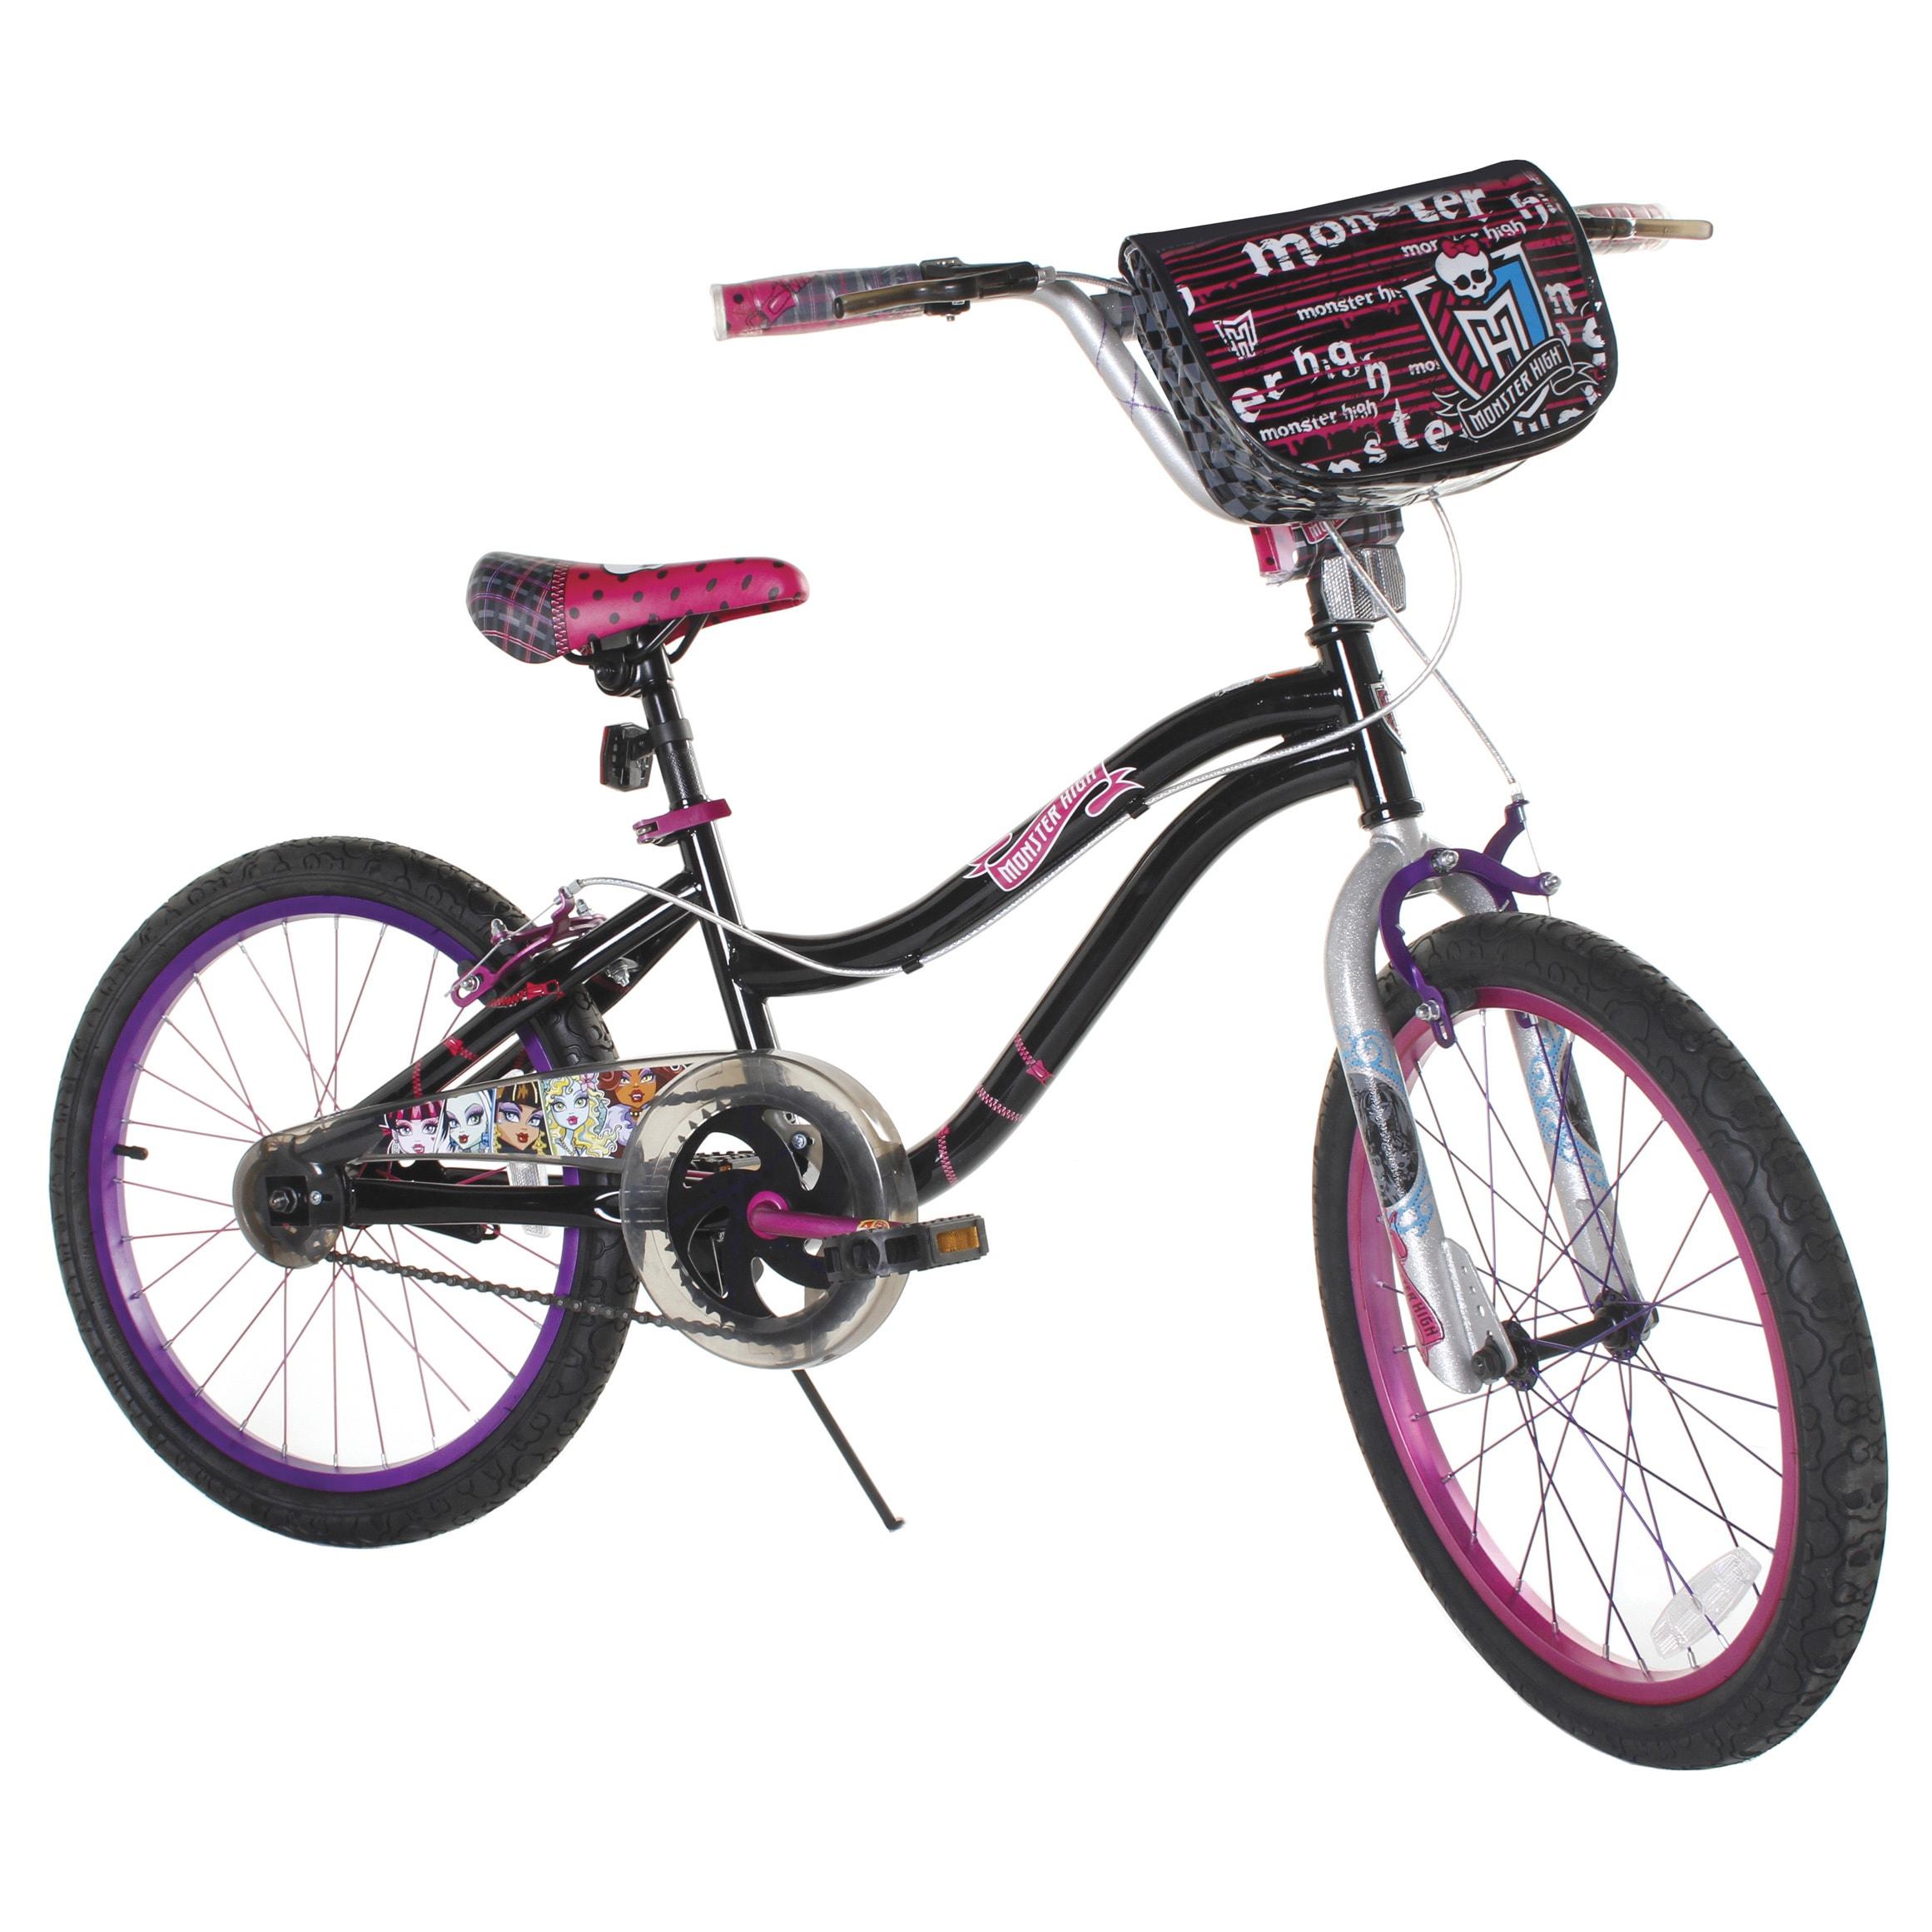 LTD Monster High 20-inch Girls Bike (20'' Pink, Black)